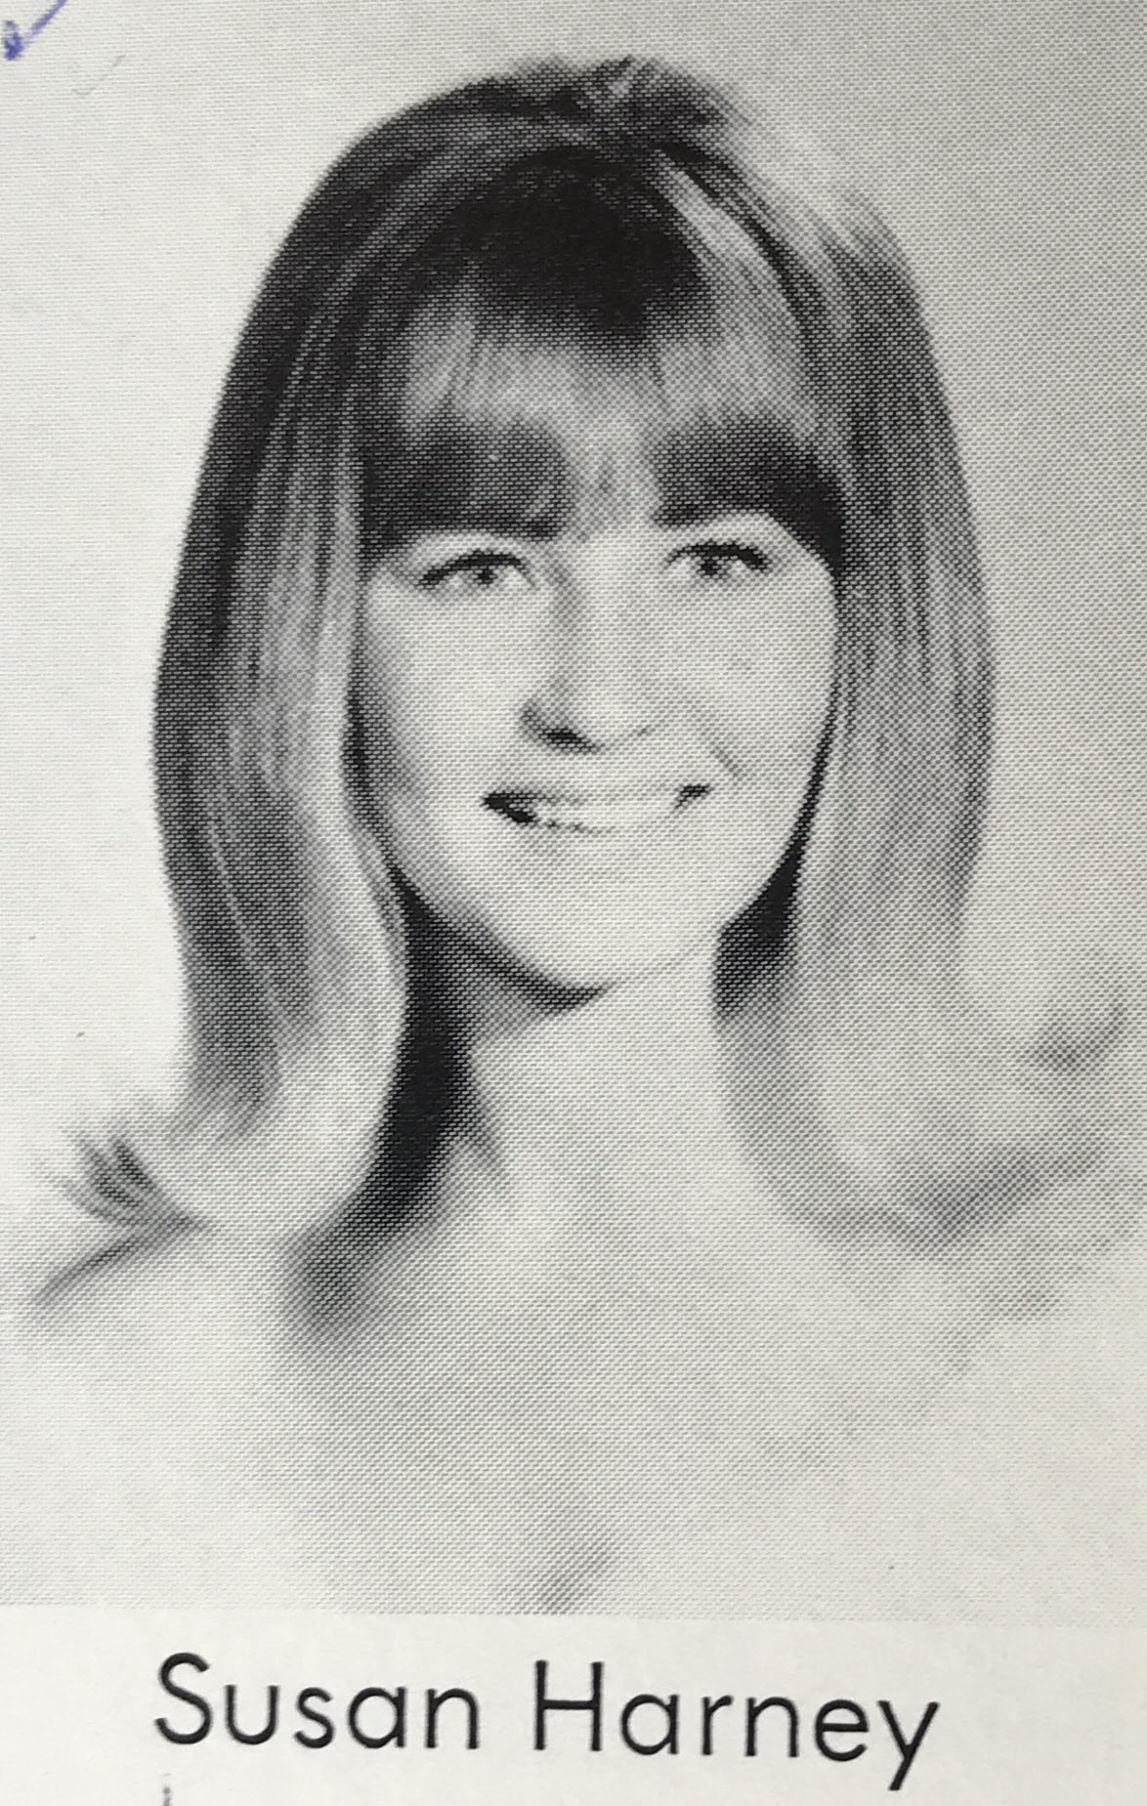 Susan Harney